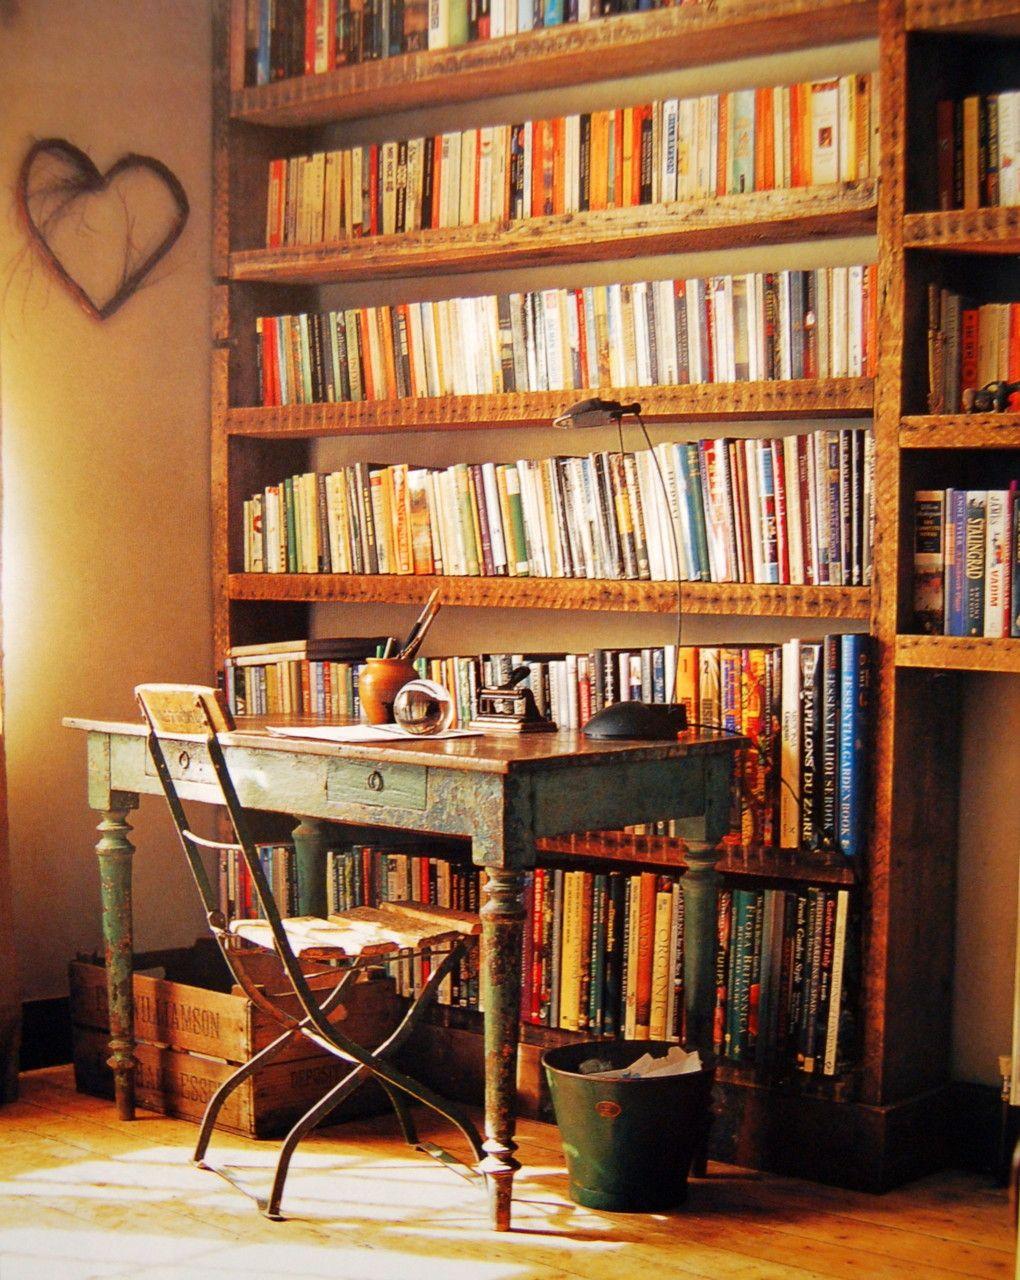 r ume und ihre b cher r ume und ihre b cher pinterest b cher regal und bibliothek. Black Bedroom Furniture Sets. Home Design Ideas